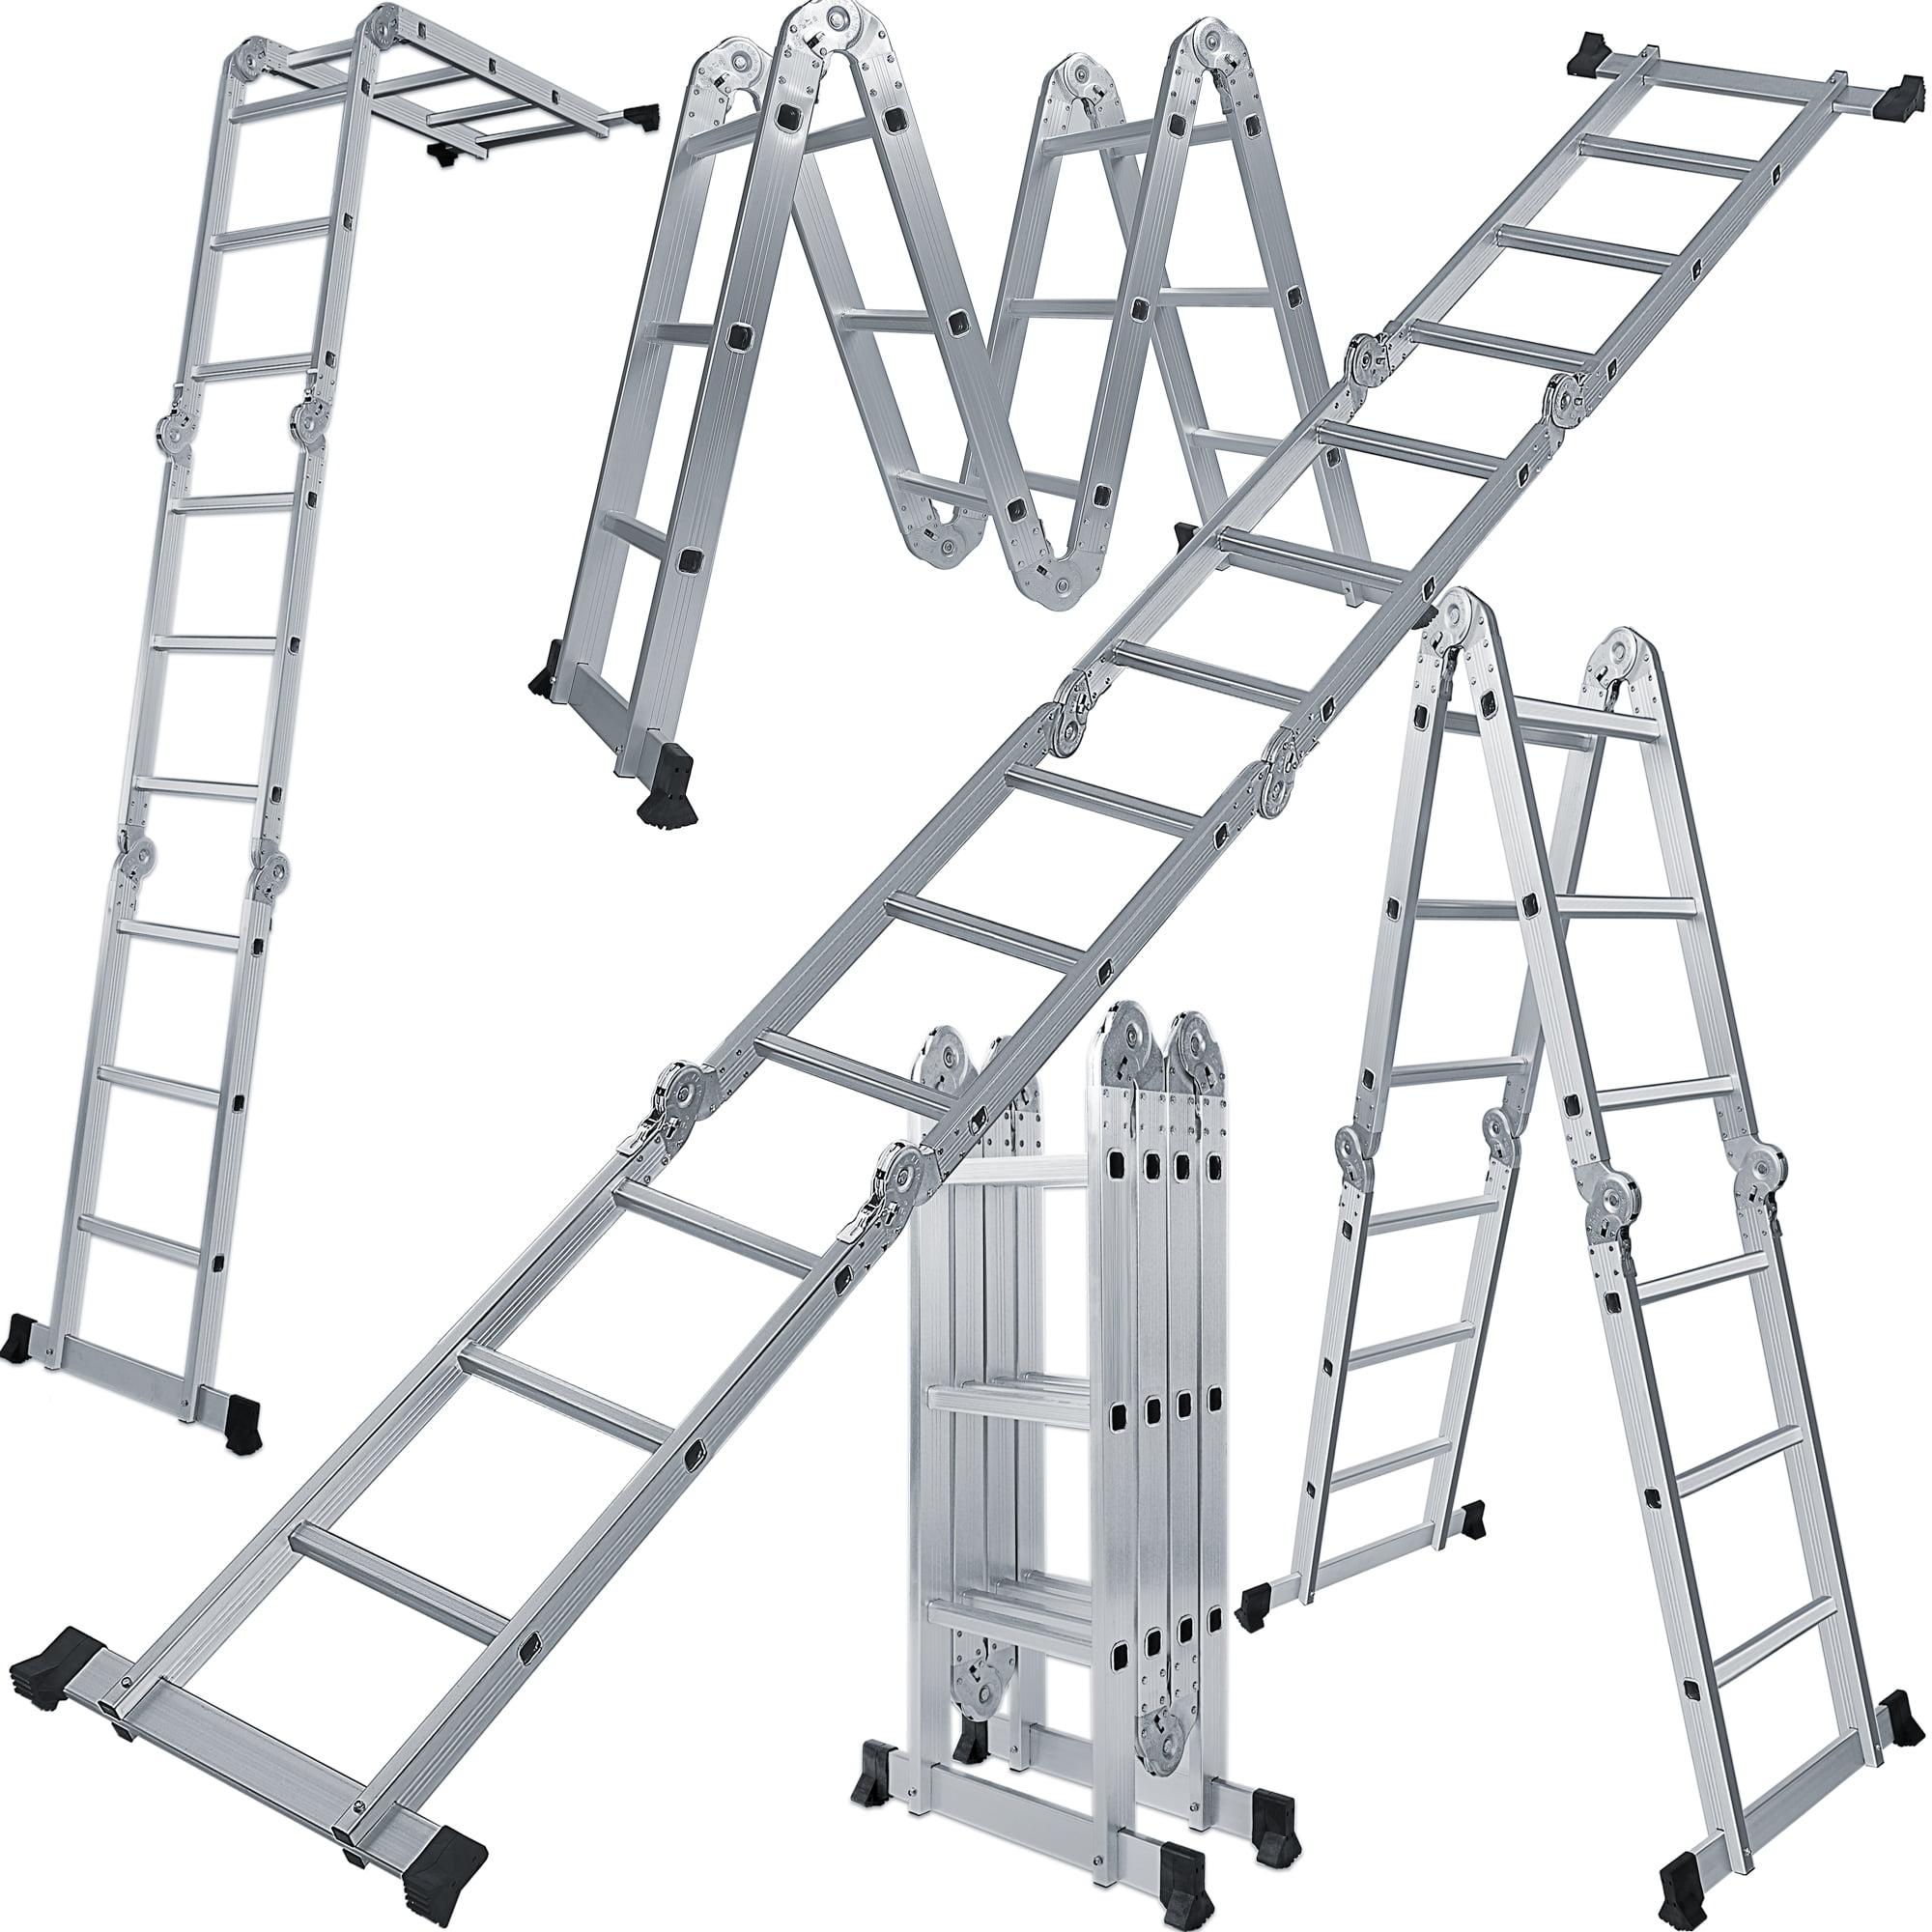 16.4ft 12.5ft Multi-Purpose Aluminum Telescopic Extension Ladder Outdoor Working